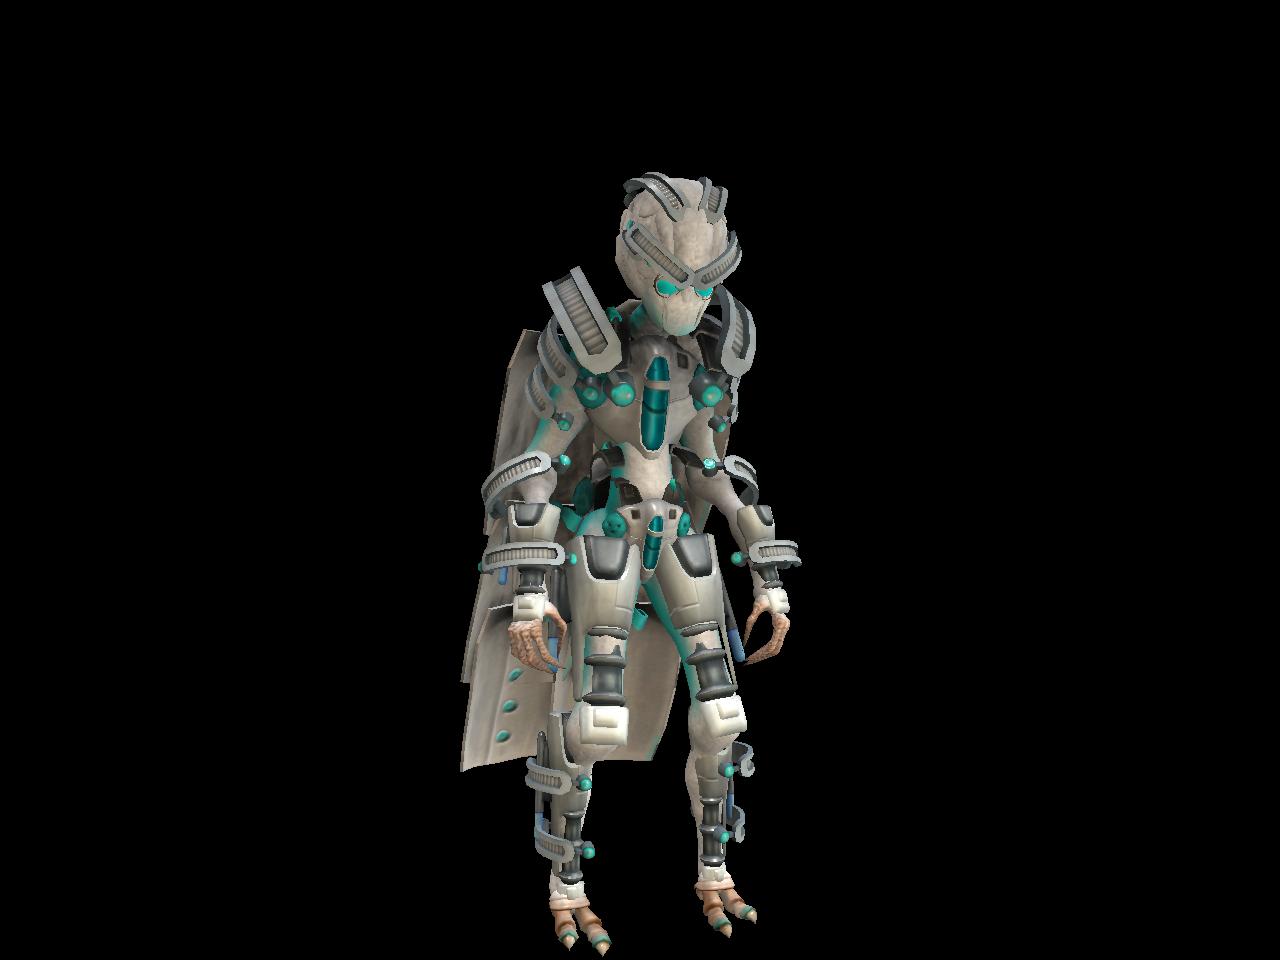 El imperio Xeeler [♫] CRE_Xeeler-1b4c58f9_ful